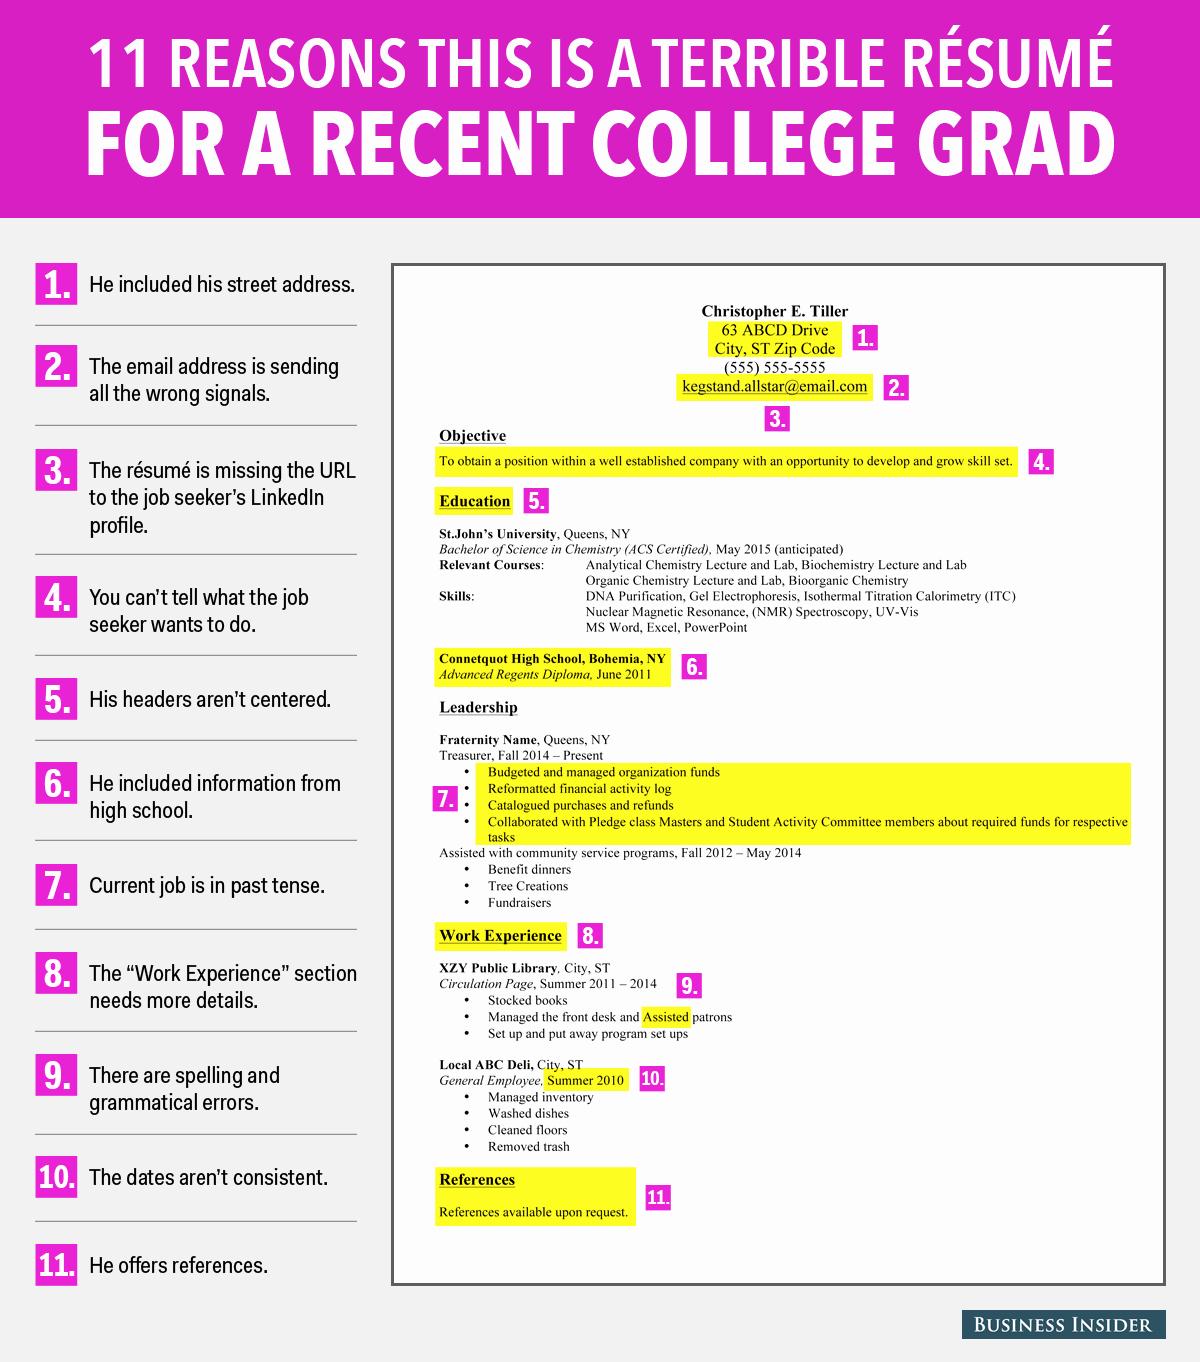 Resumes for Recent College Graduates Beautiful Terrible Resume for A Recent College Grad Business Insider